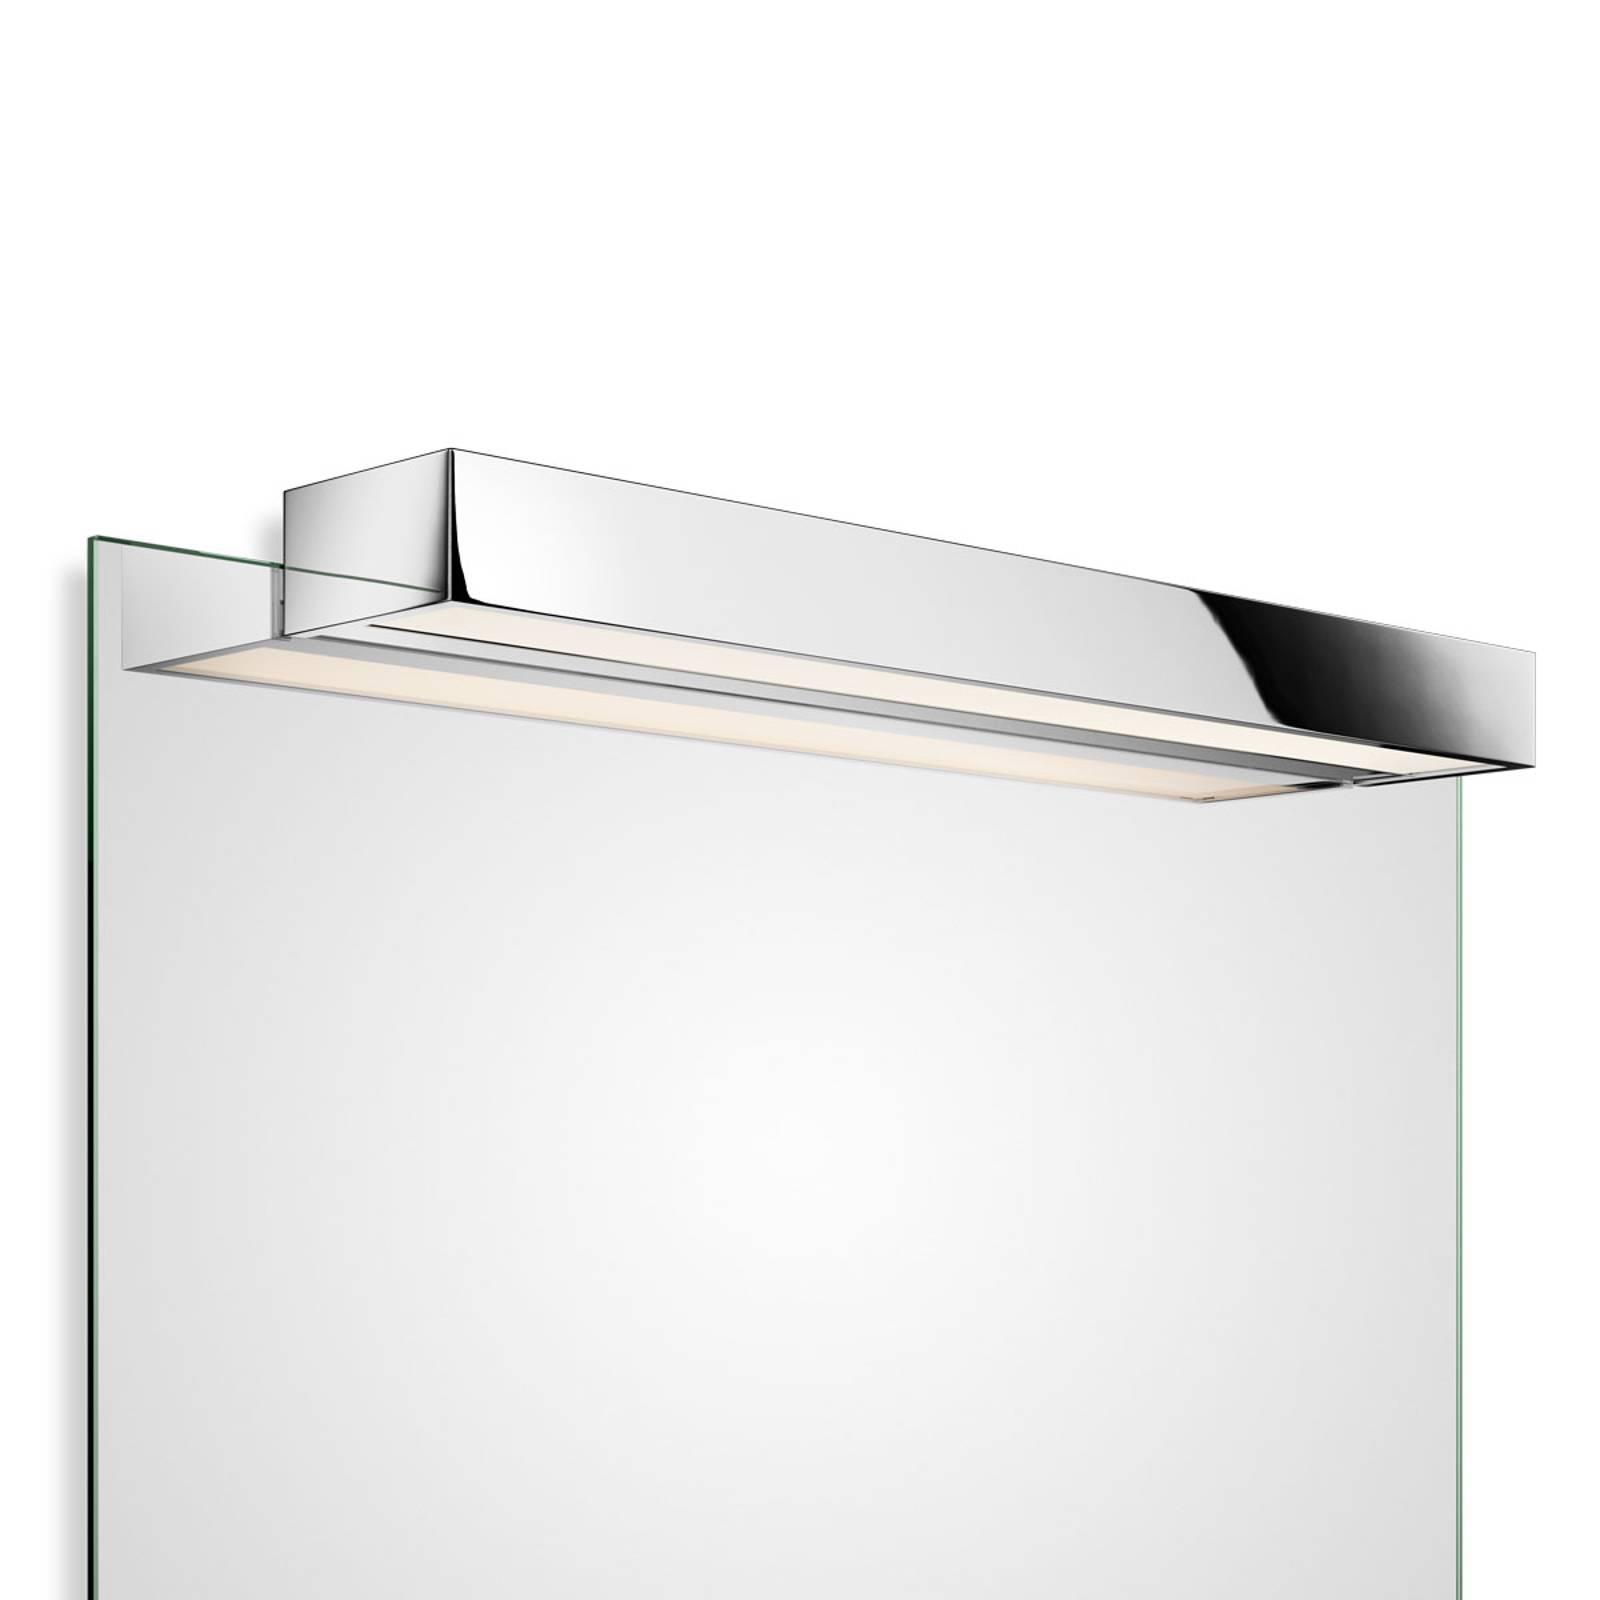 Decor Walther Box 1-60 N -LED-peililamppu 3 000 K